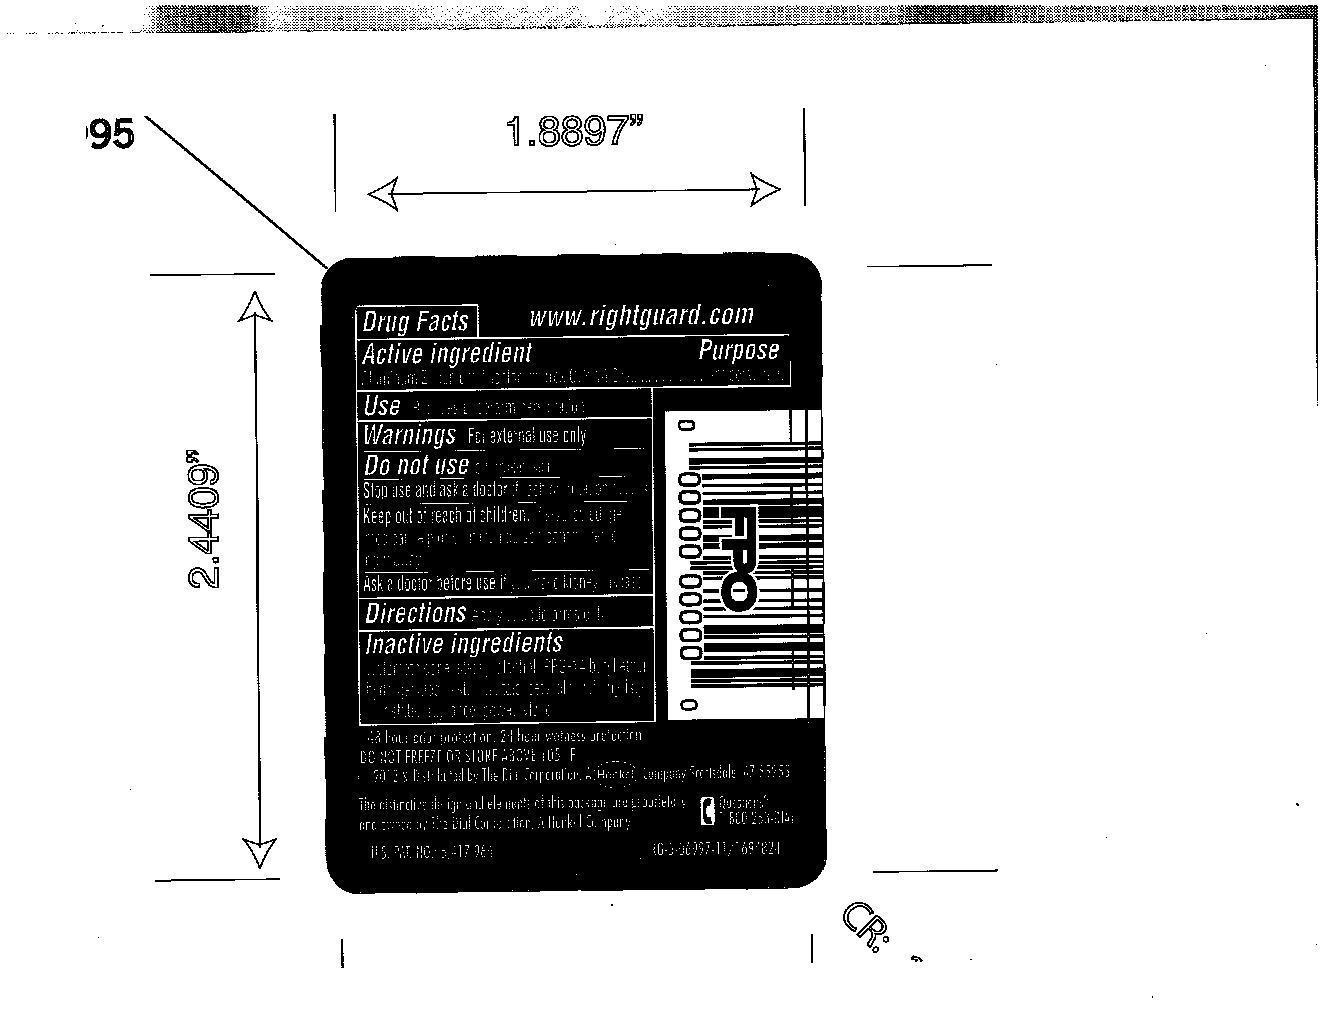 Right Guard Sport Triathlon (Aluminum Zirconium Octachlorhydrex Gly) Stick [Vvf Illinois Services]